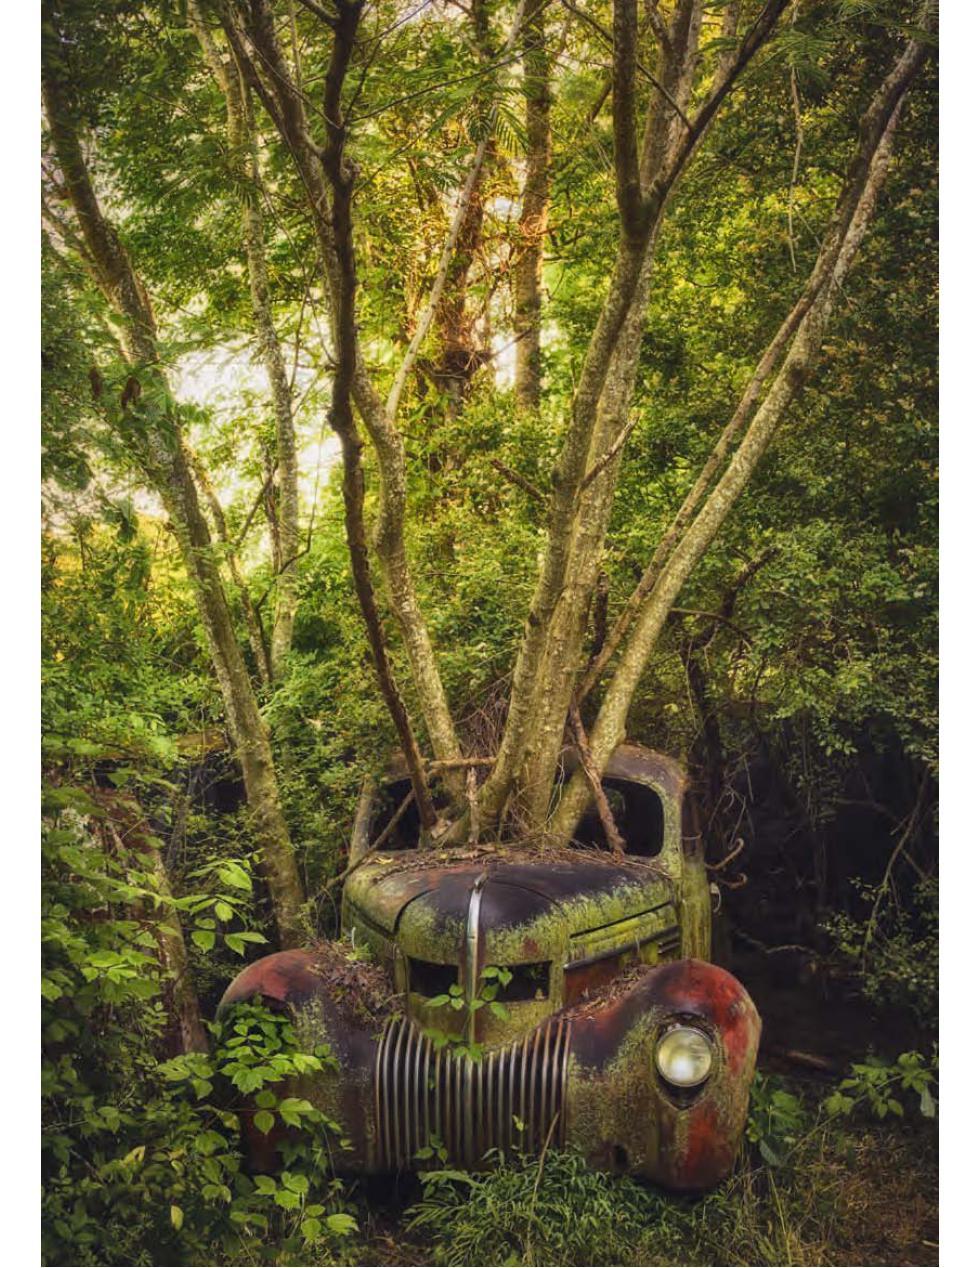 Lost Cars